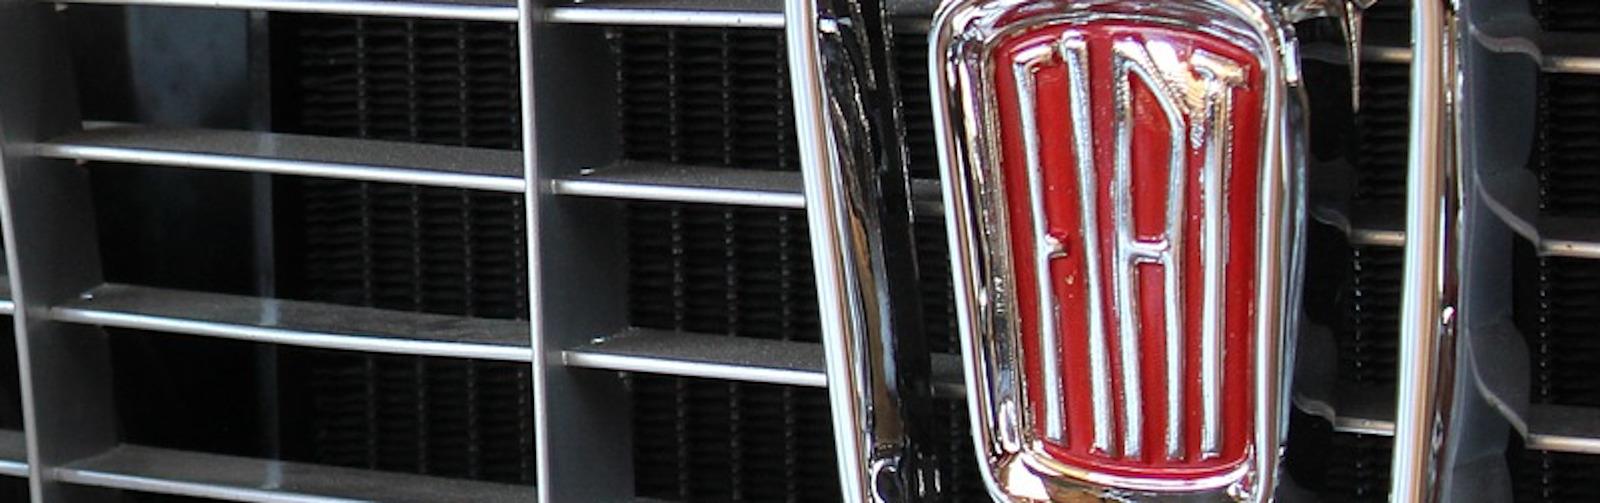 Fiat Ducato, Wohnmobil, Abgasskandal